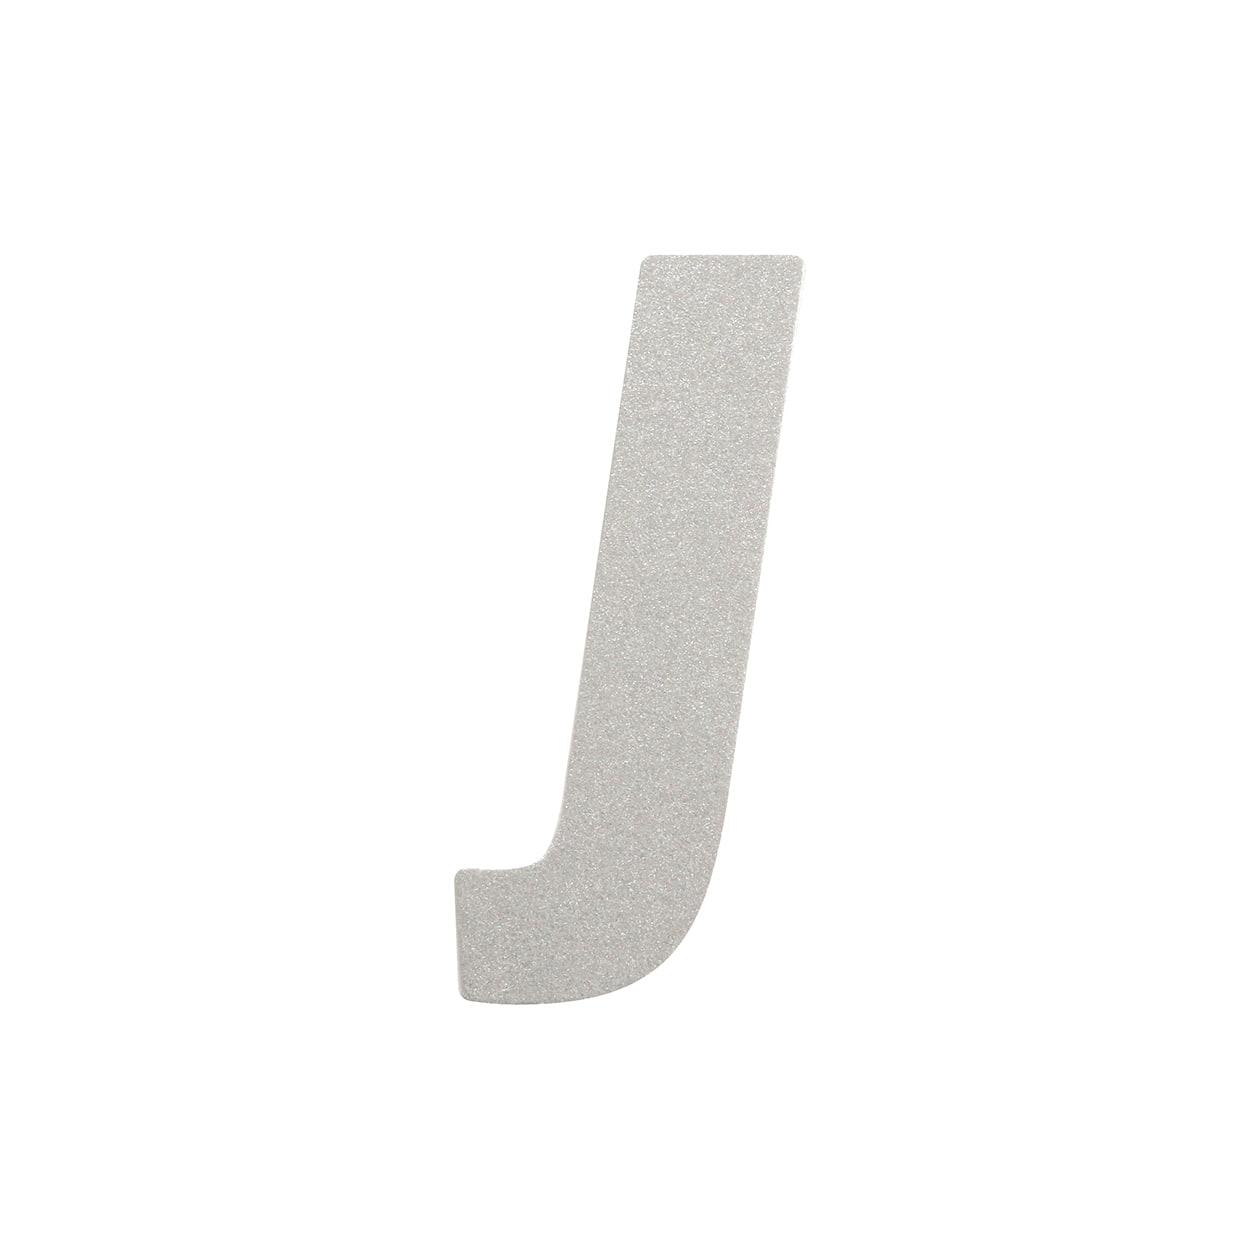 No.395ボード A7カードDC 文字J シルバー